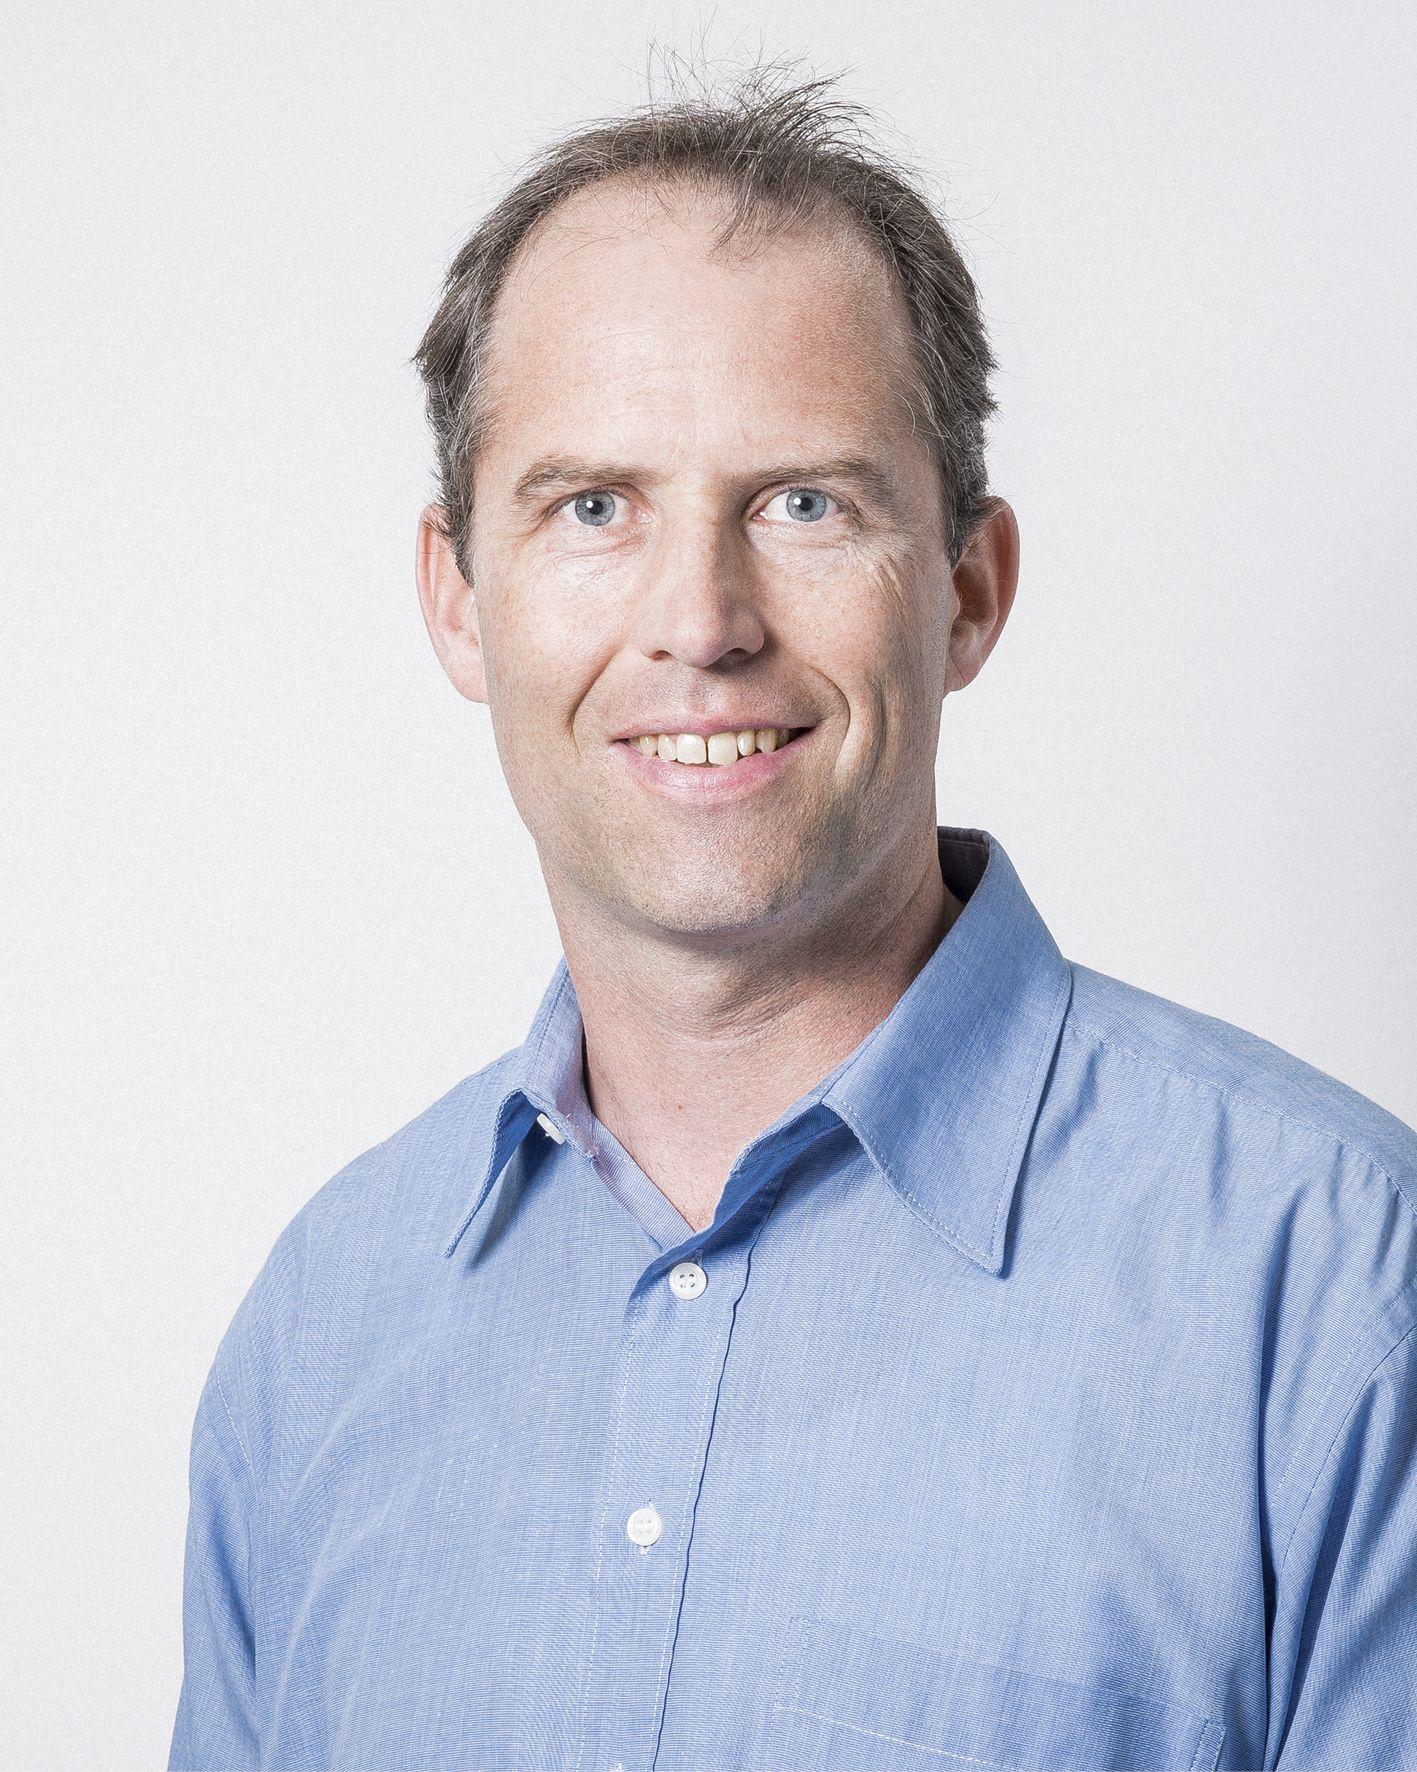 Claudio Bock